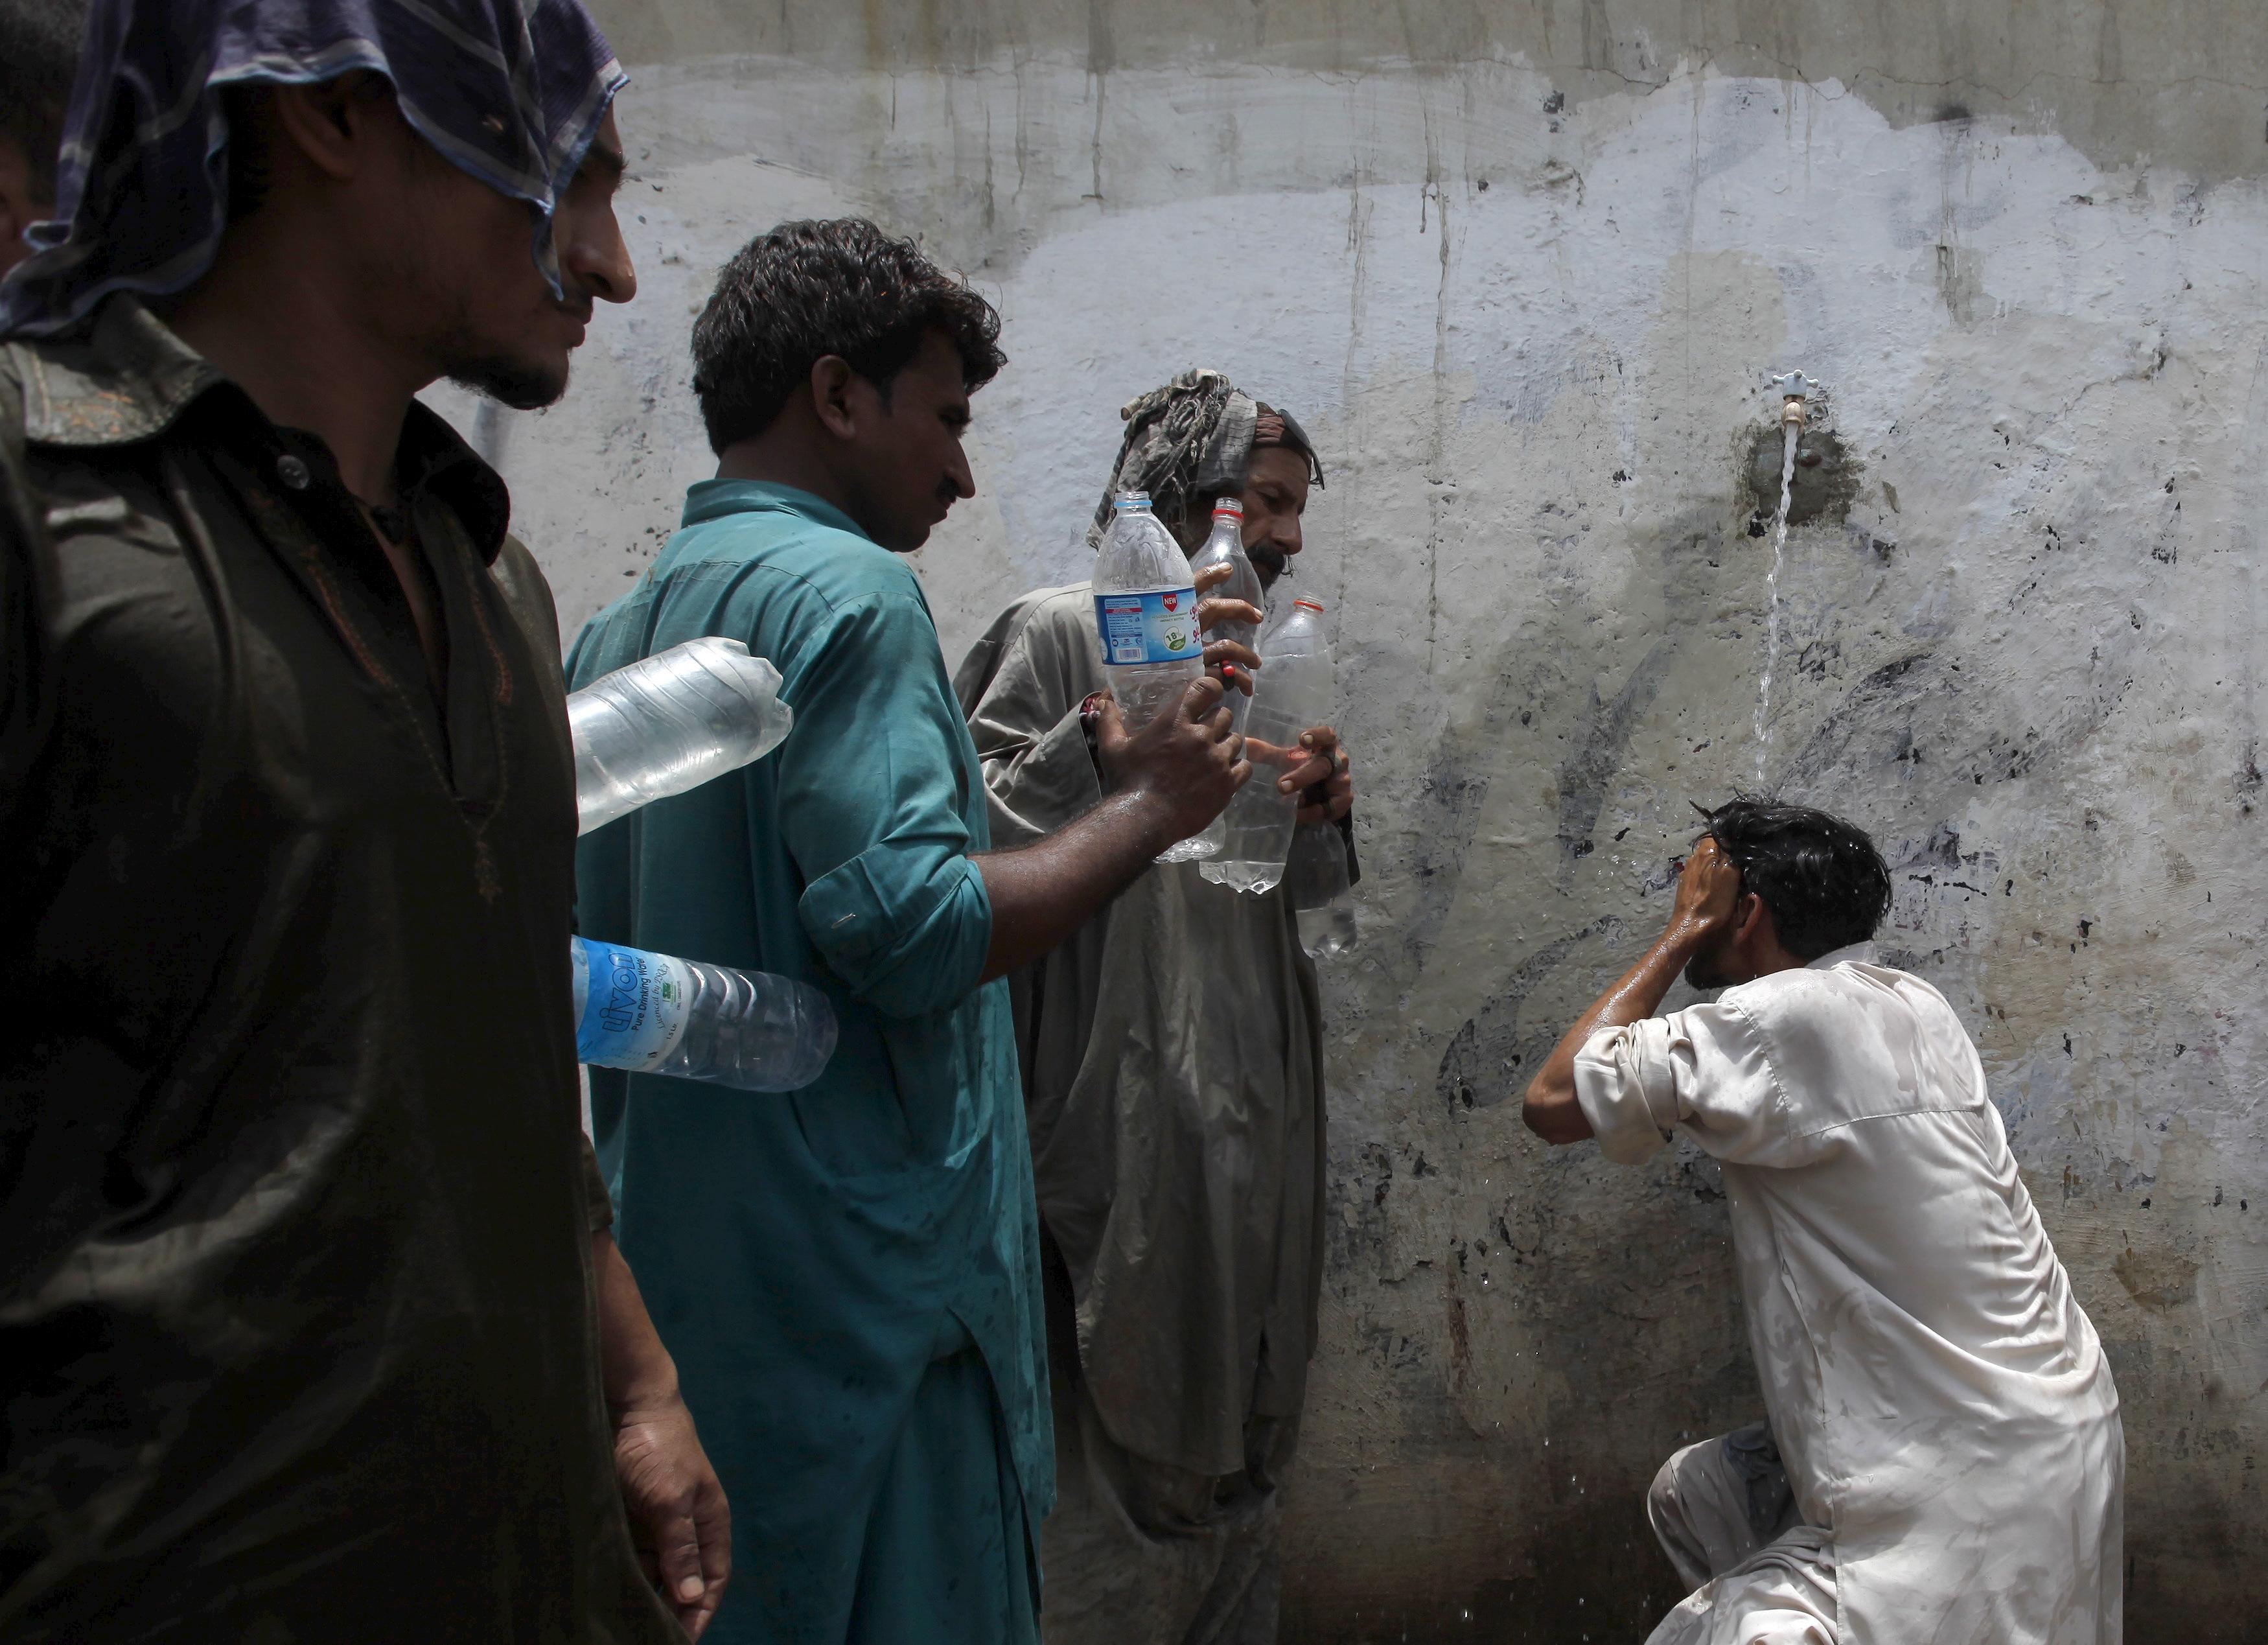 Men fill their water bottles at a public tap in Karachi, Pakistan on June 23, following days of intense heat. Photo by Akhtar Soomro/Reuters